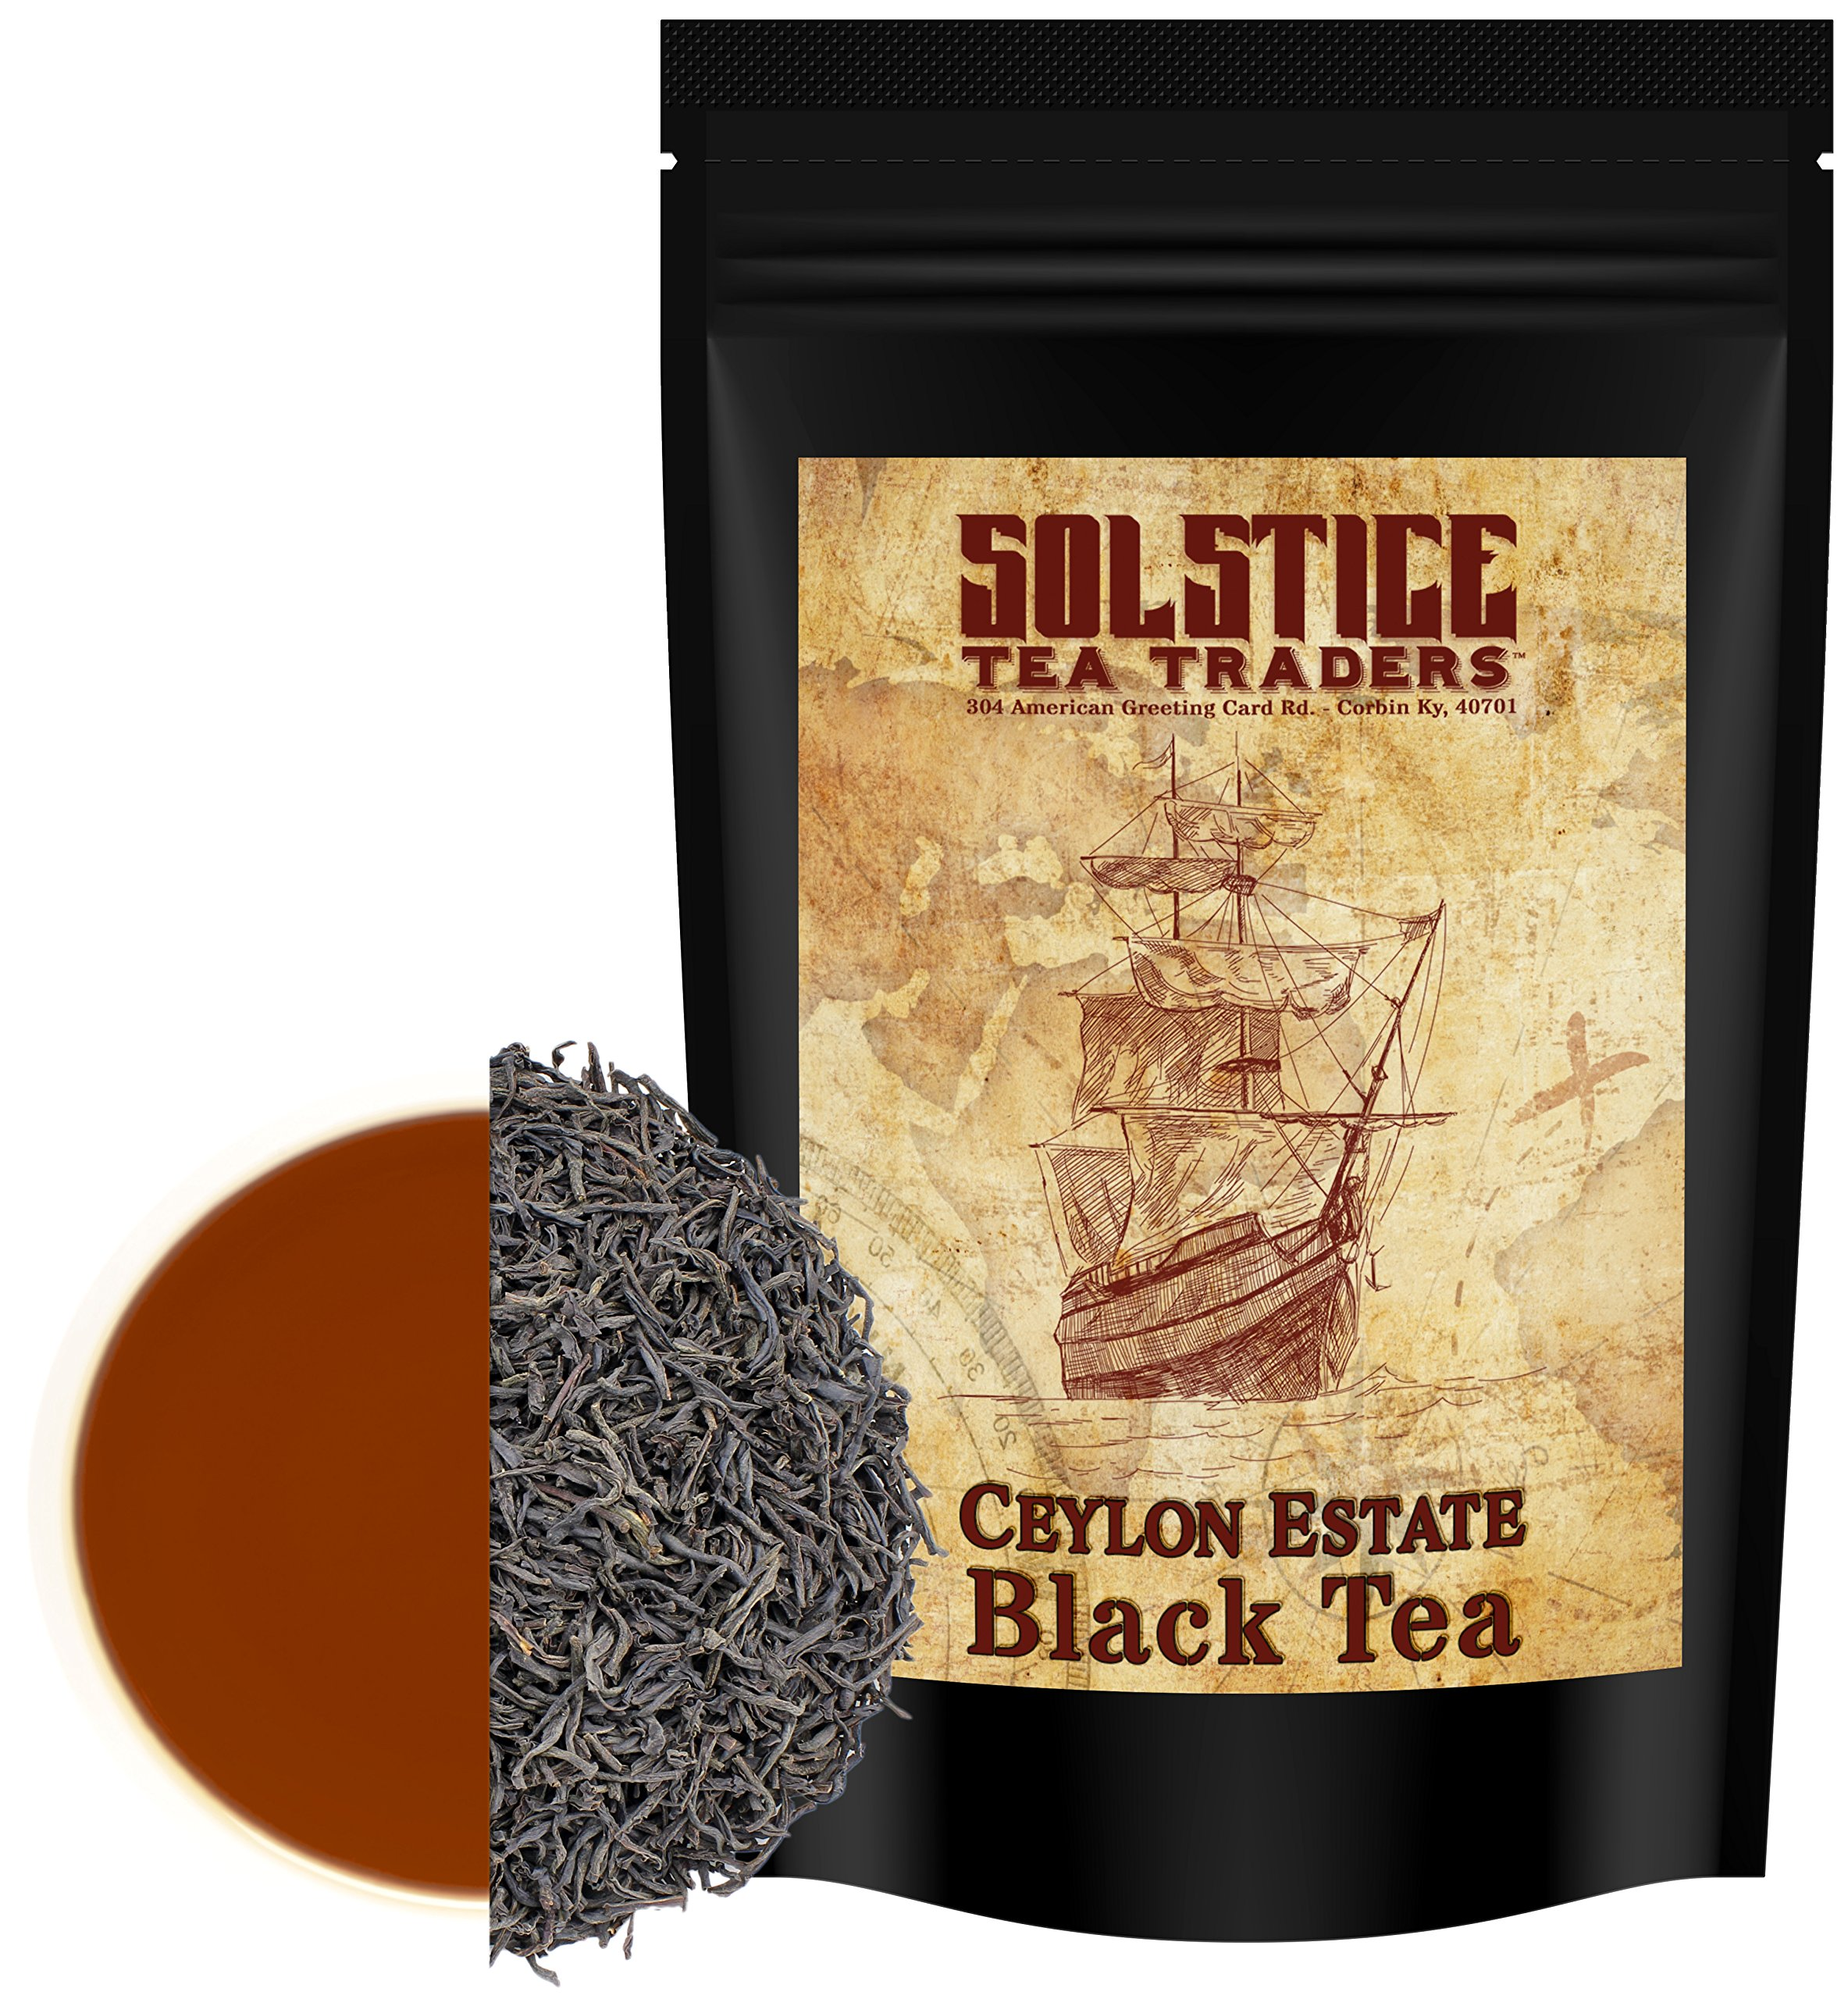 Ceylon Estate Blend BOP Loose Leaf Black Tea (8-Ounce Bulk Bag); 100% Sri Lanka Origin Tea, Makes 100+ Cups of Tea by Solstice Tea Traders